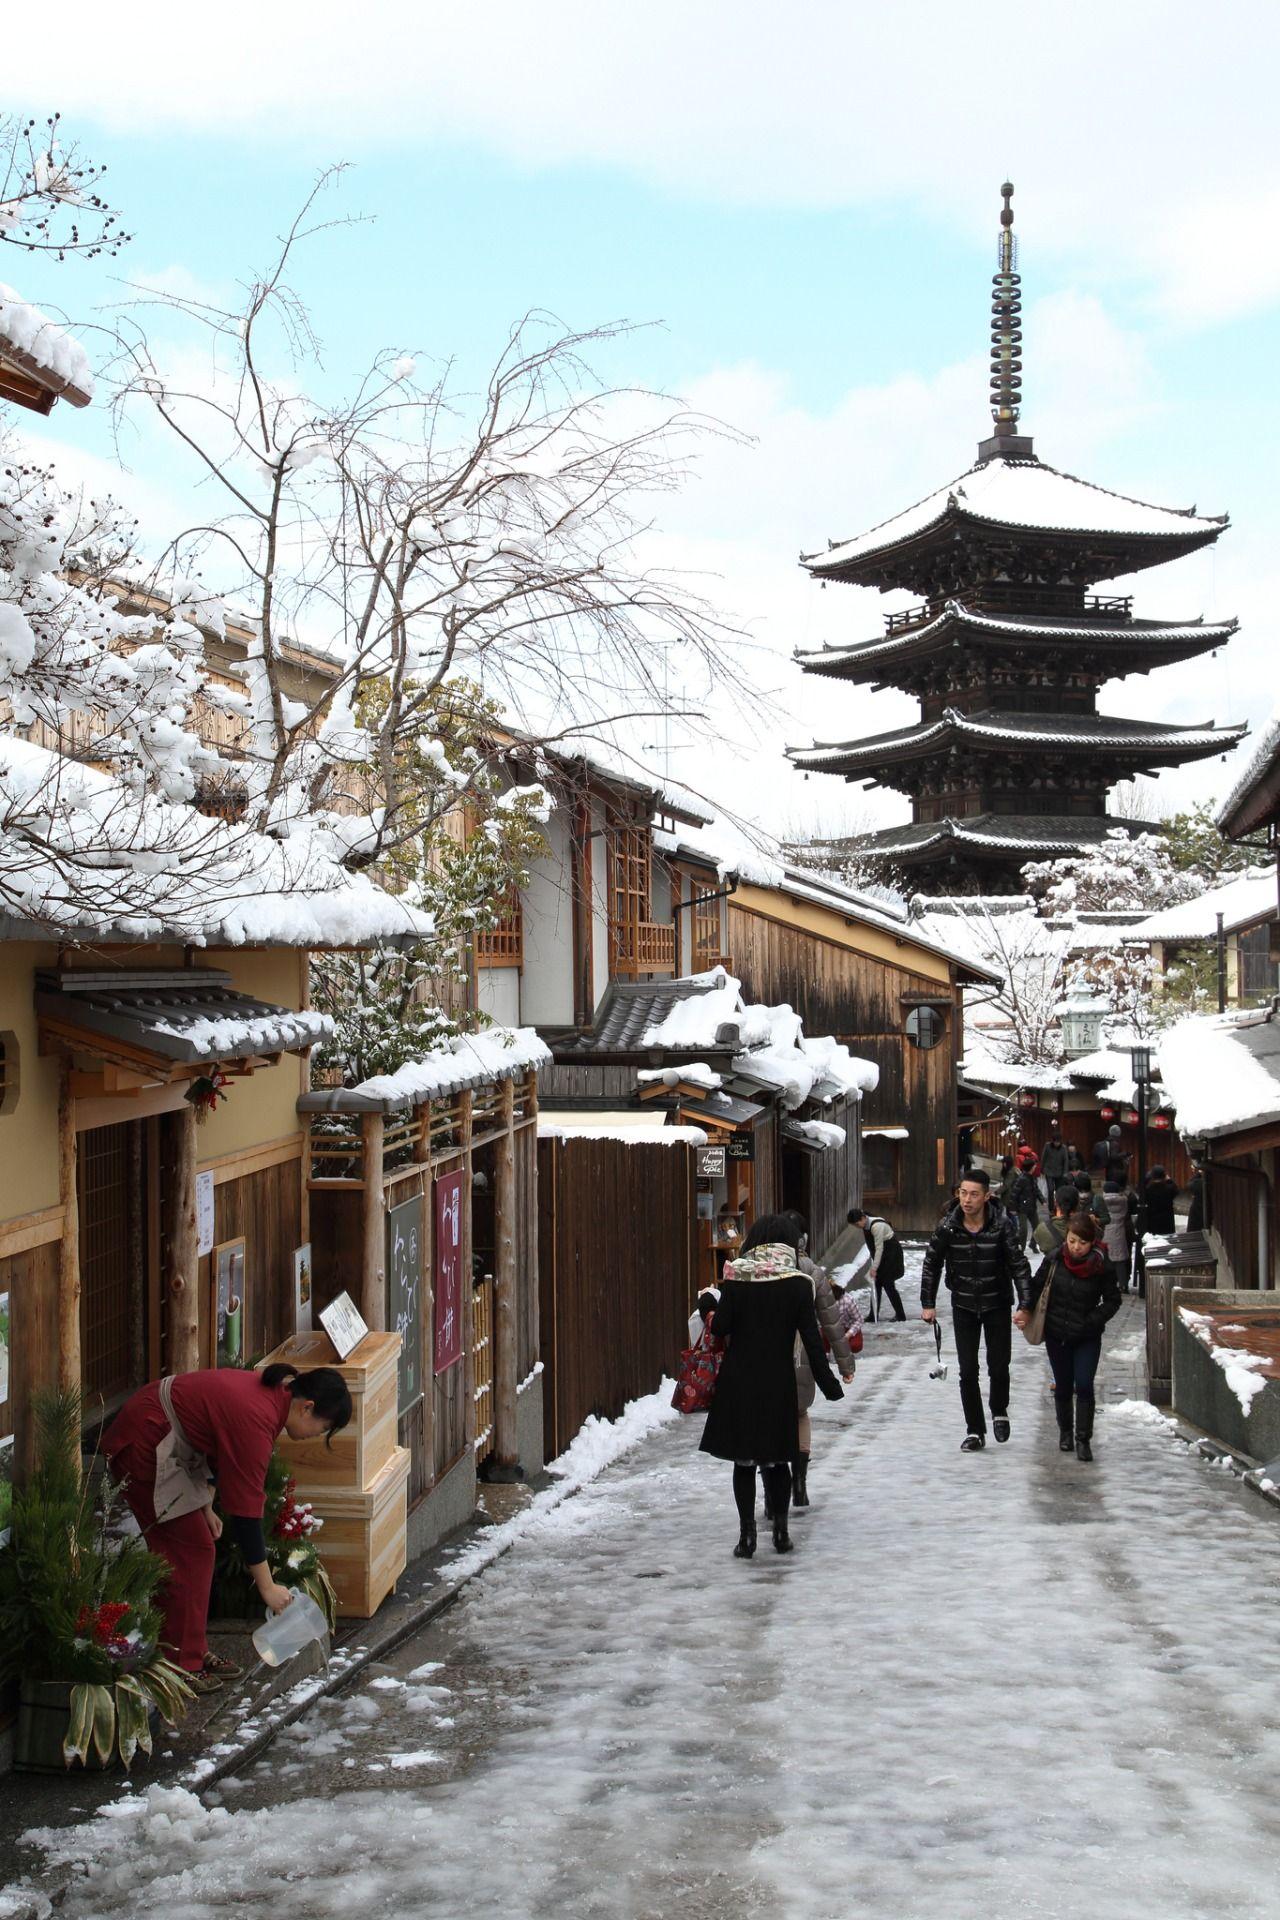 kyoto in winter by teruhide tomori japan pinterest. Black Bedroom Furniture Sets. Home Design Ideas